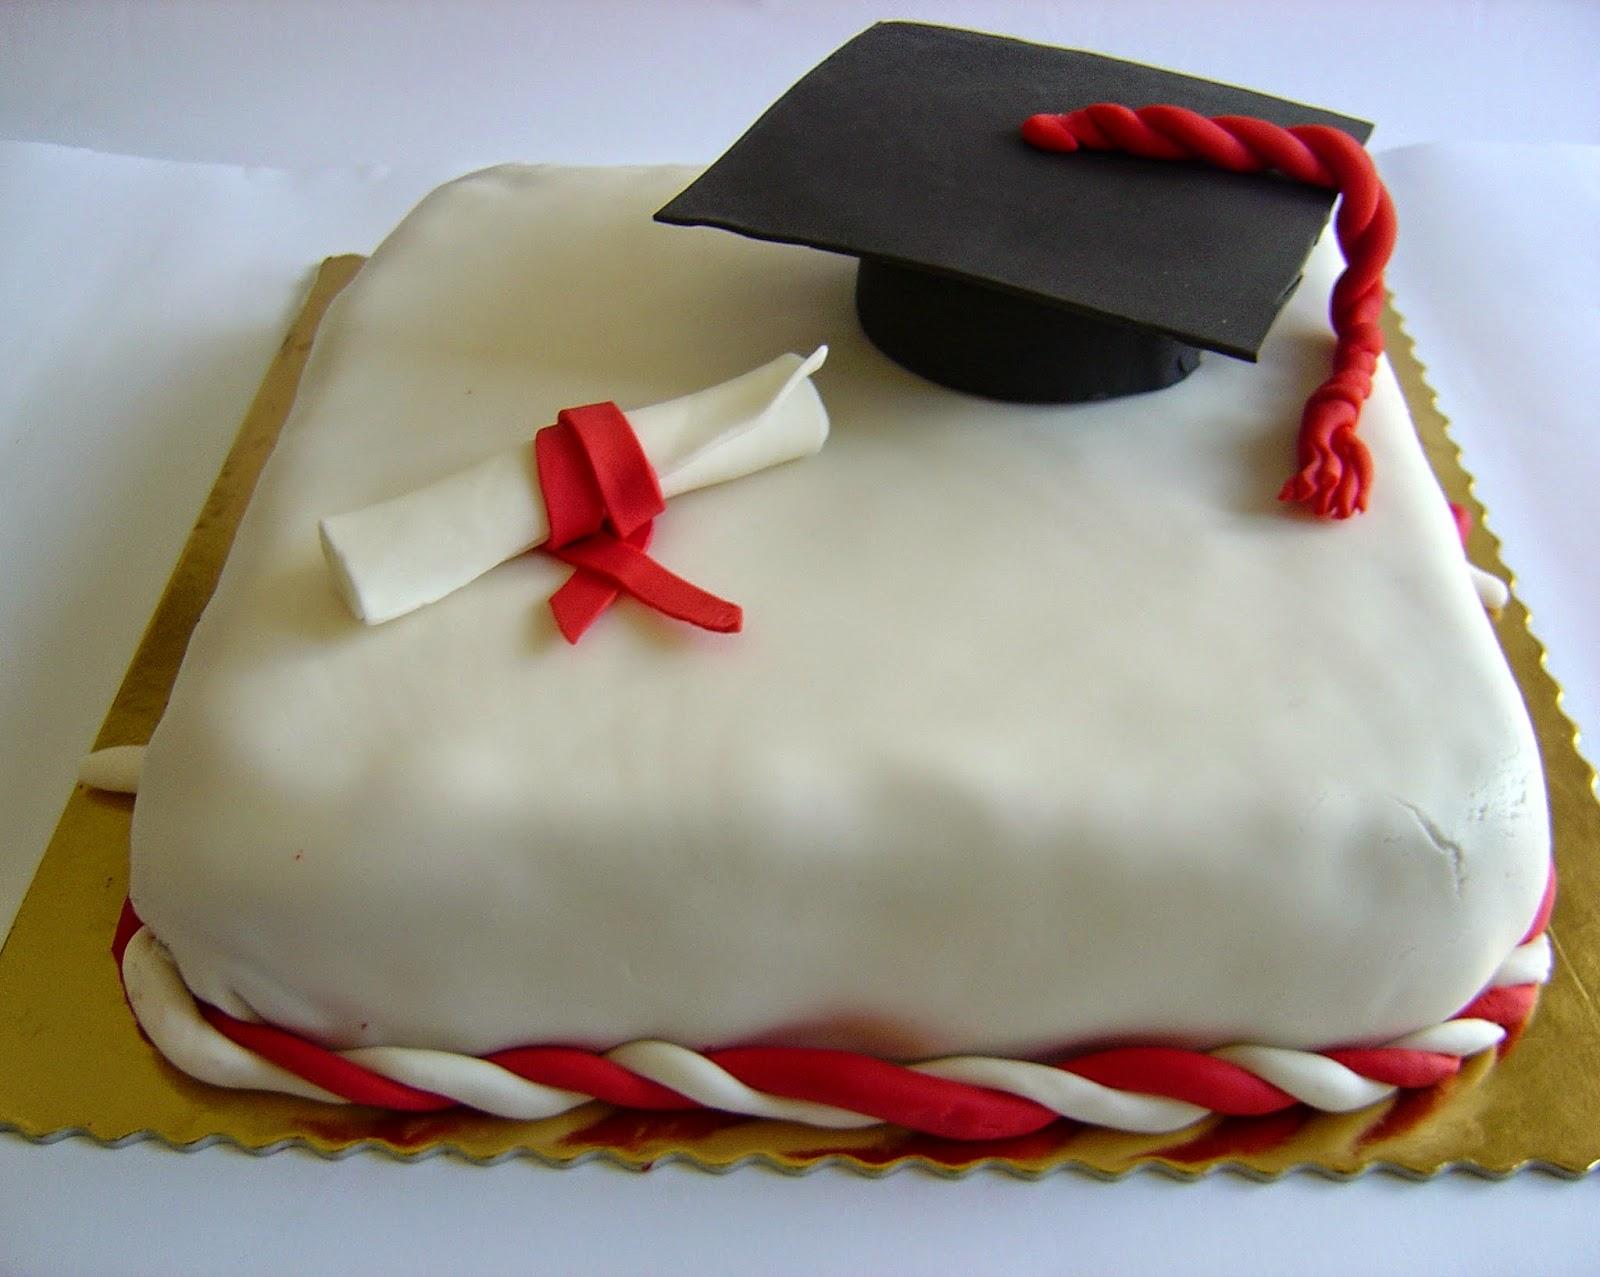 Super La cucina piccoLINA: Torta di laurea per Federico HF97